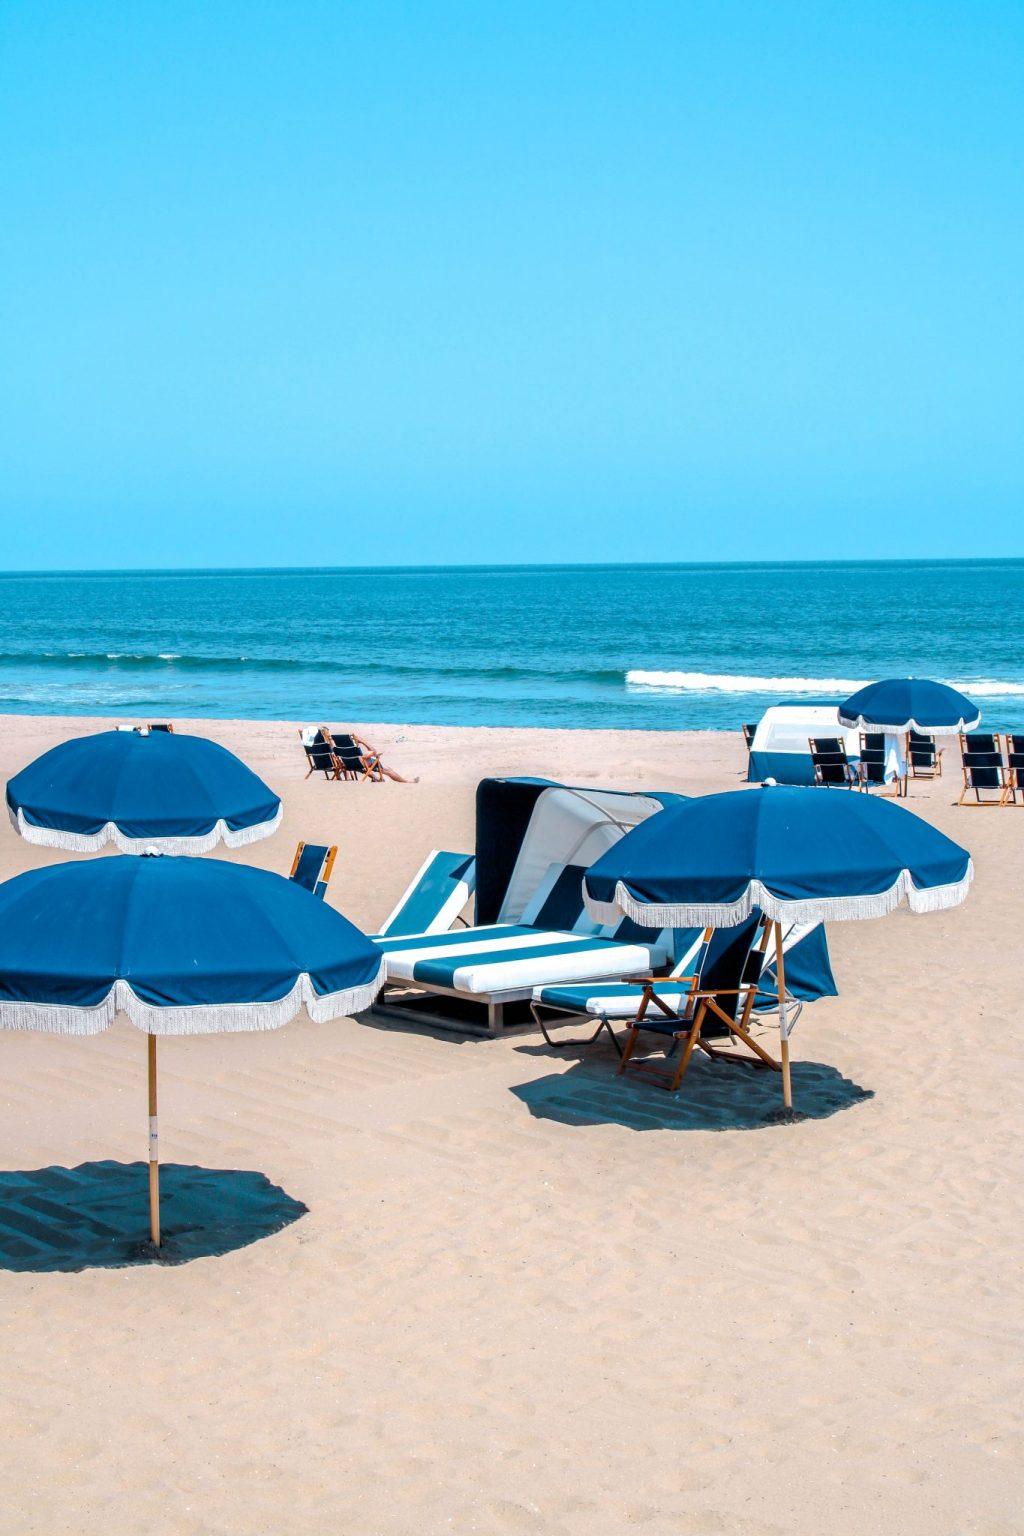 Beach CLub - Cavalier Hotel